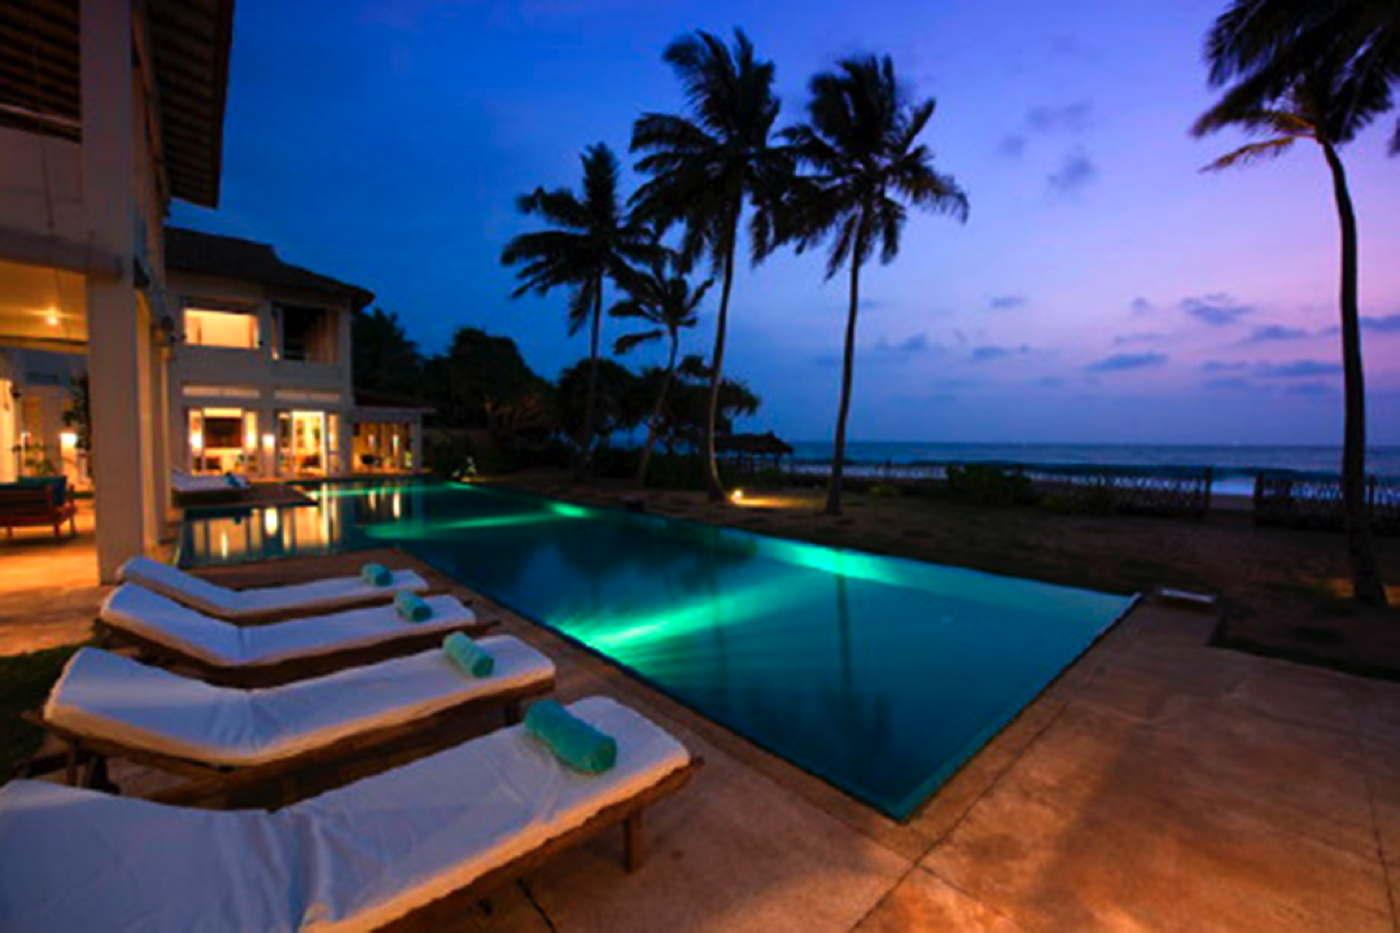 Luxusvilla am meer mit pool  Ferienvilla am Strand mieten-Villa mit Pool und Service-Sri Lanka ...